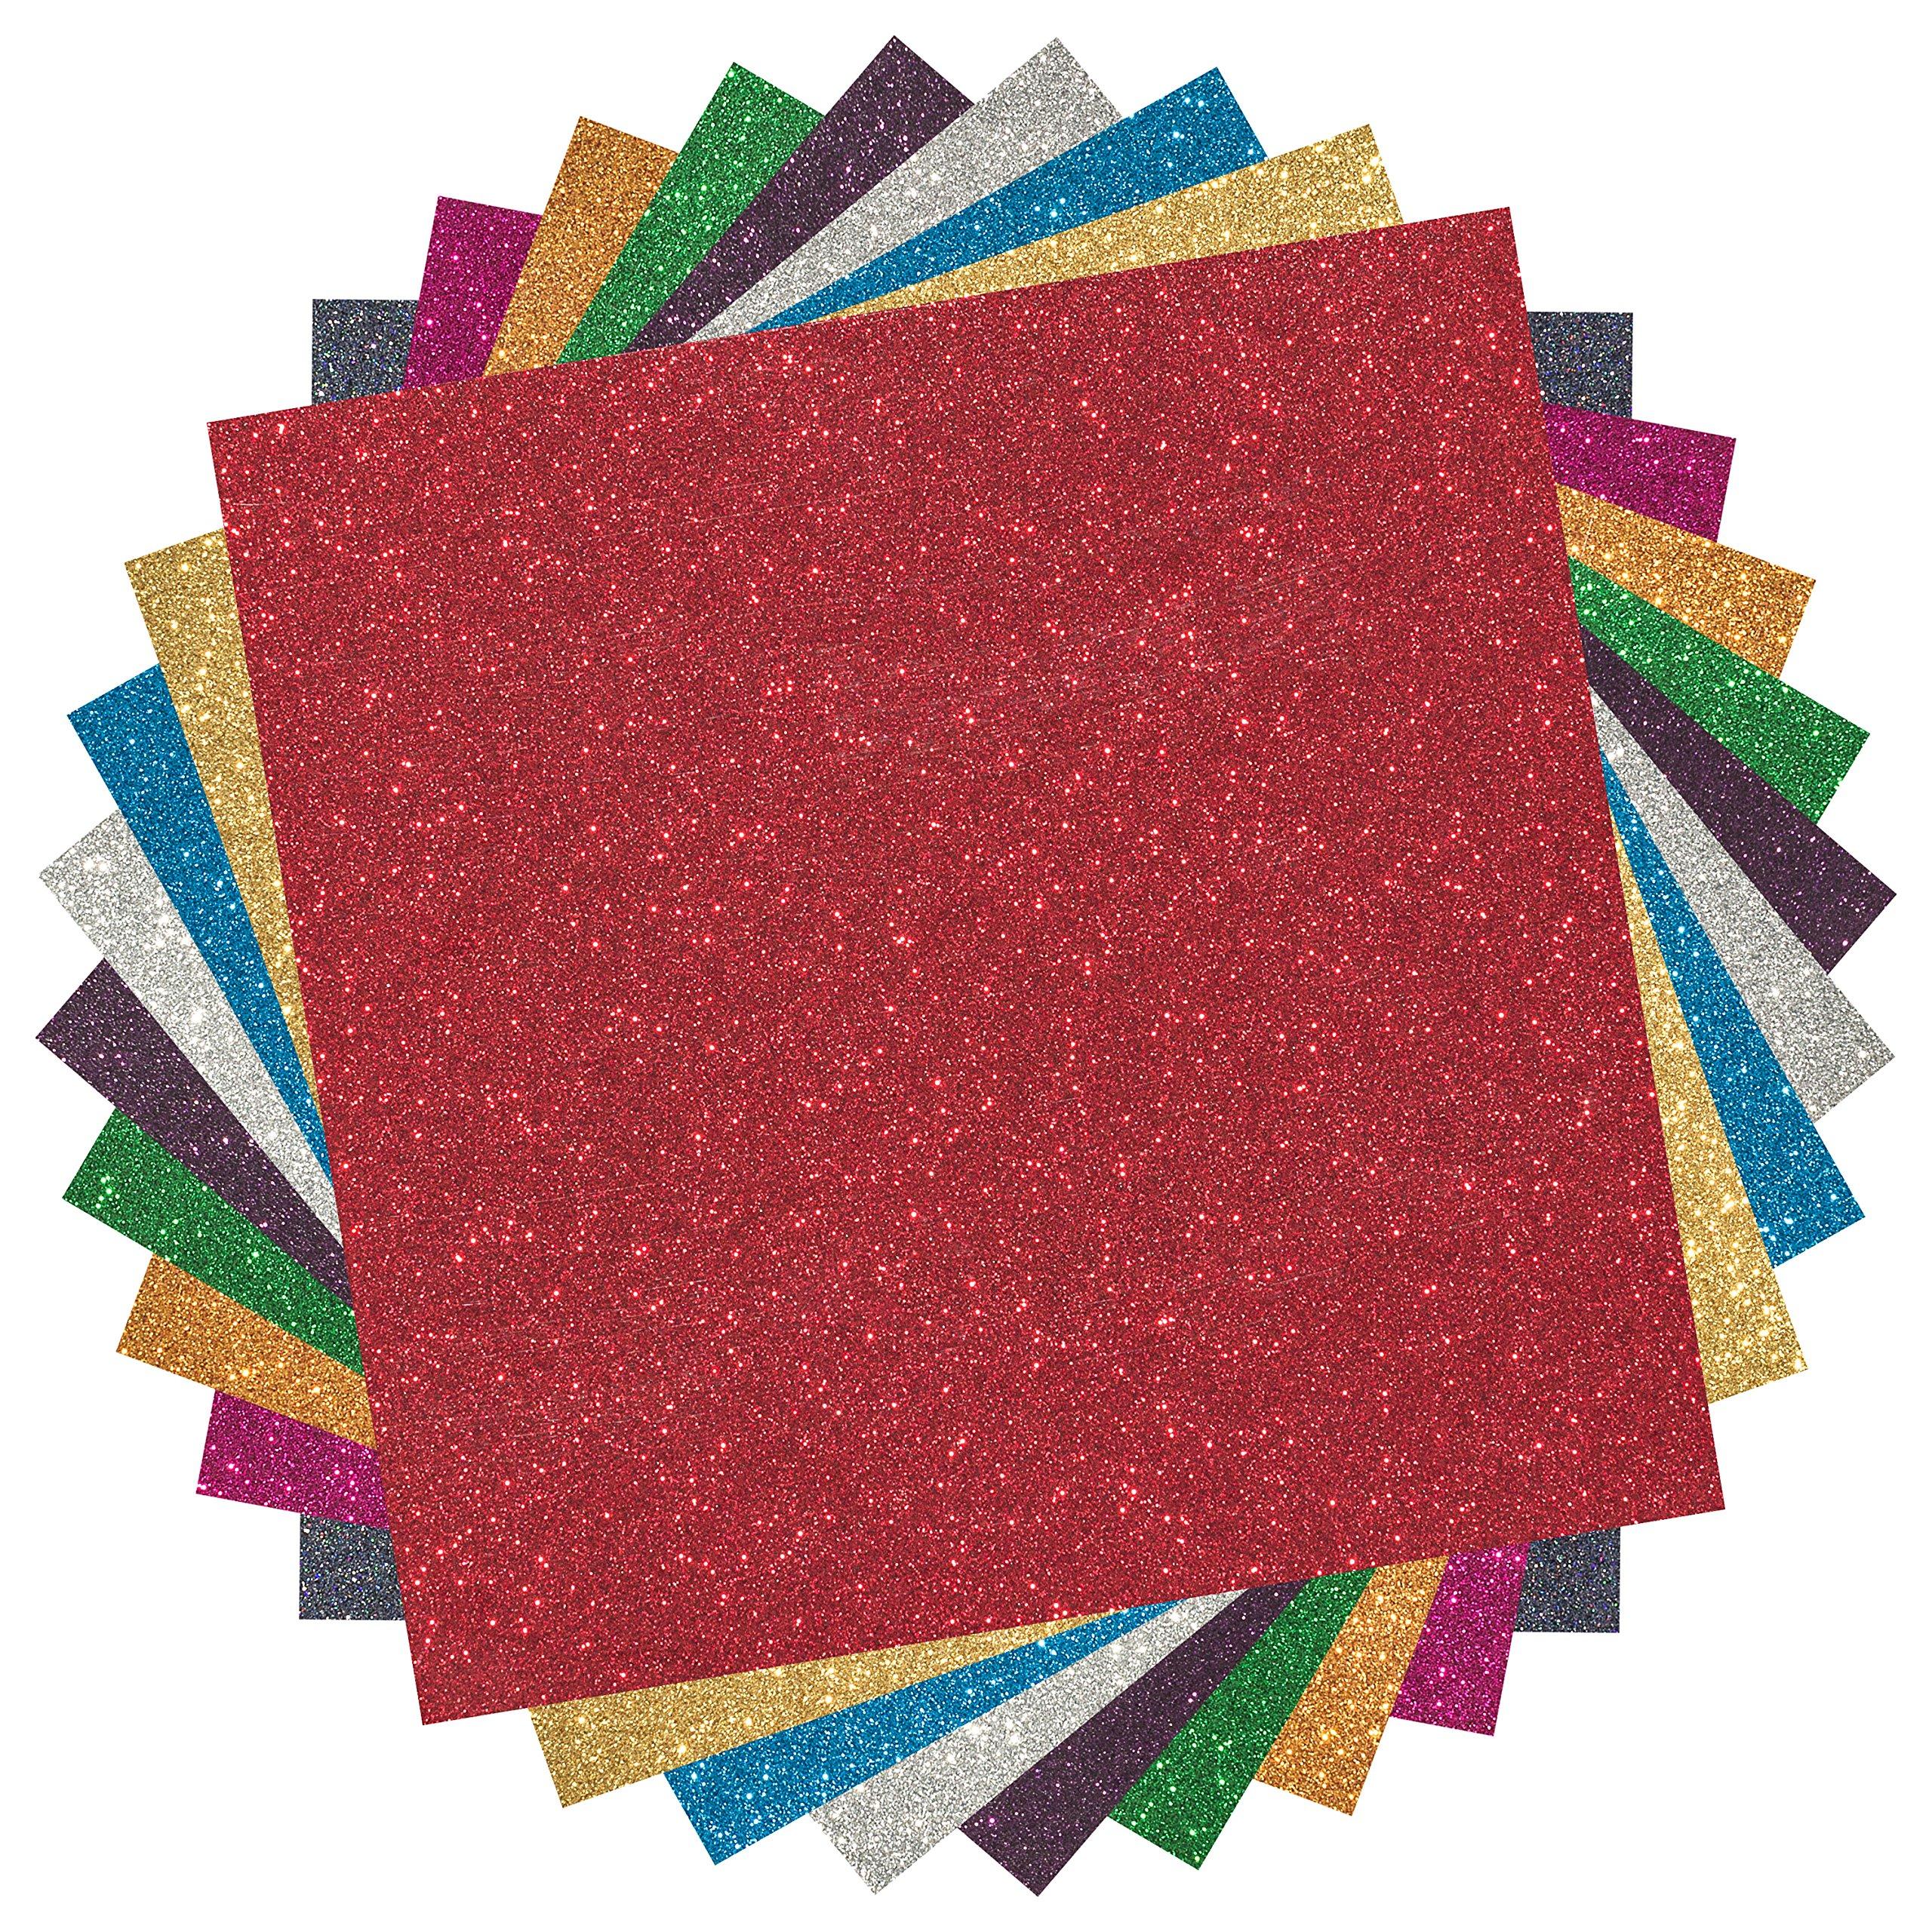 MAREA Premium Glitter Heat Transfer Vinyl (HTV) Sheets - 9 Color Bundle Pack, multi-colors, Vinyl Heat Transfer, HTV Bundle for T-shirts & Iron On, Silhouette Cameo, Heat Press & Cricut Machine